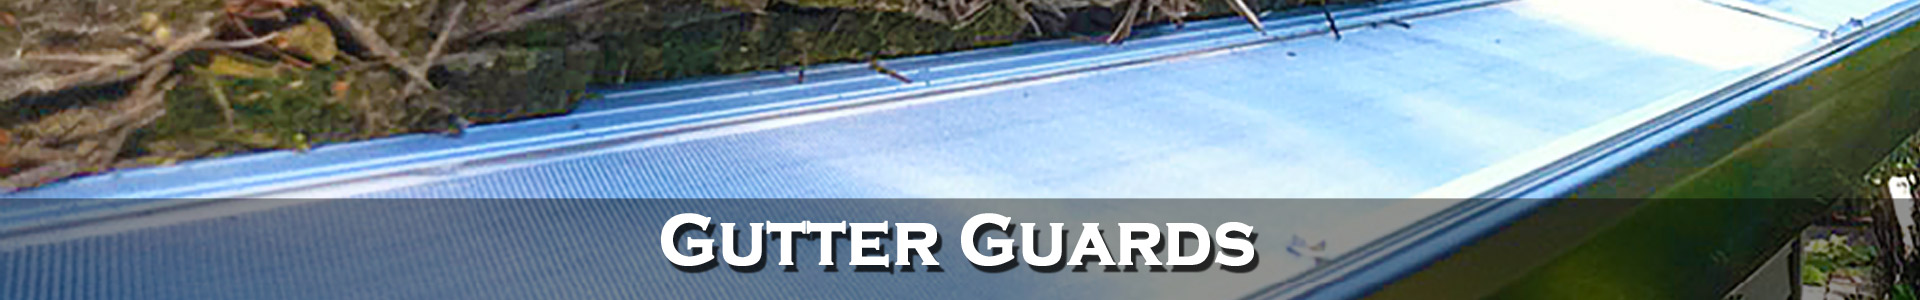 Gutter Guards Seattle